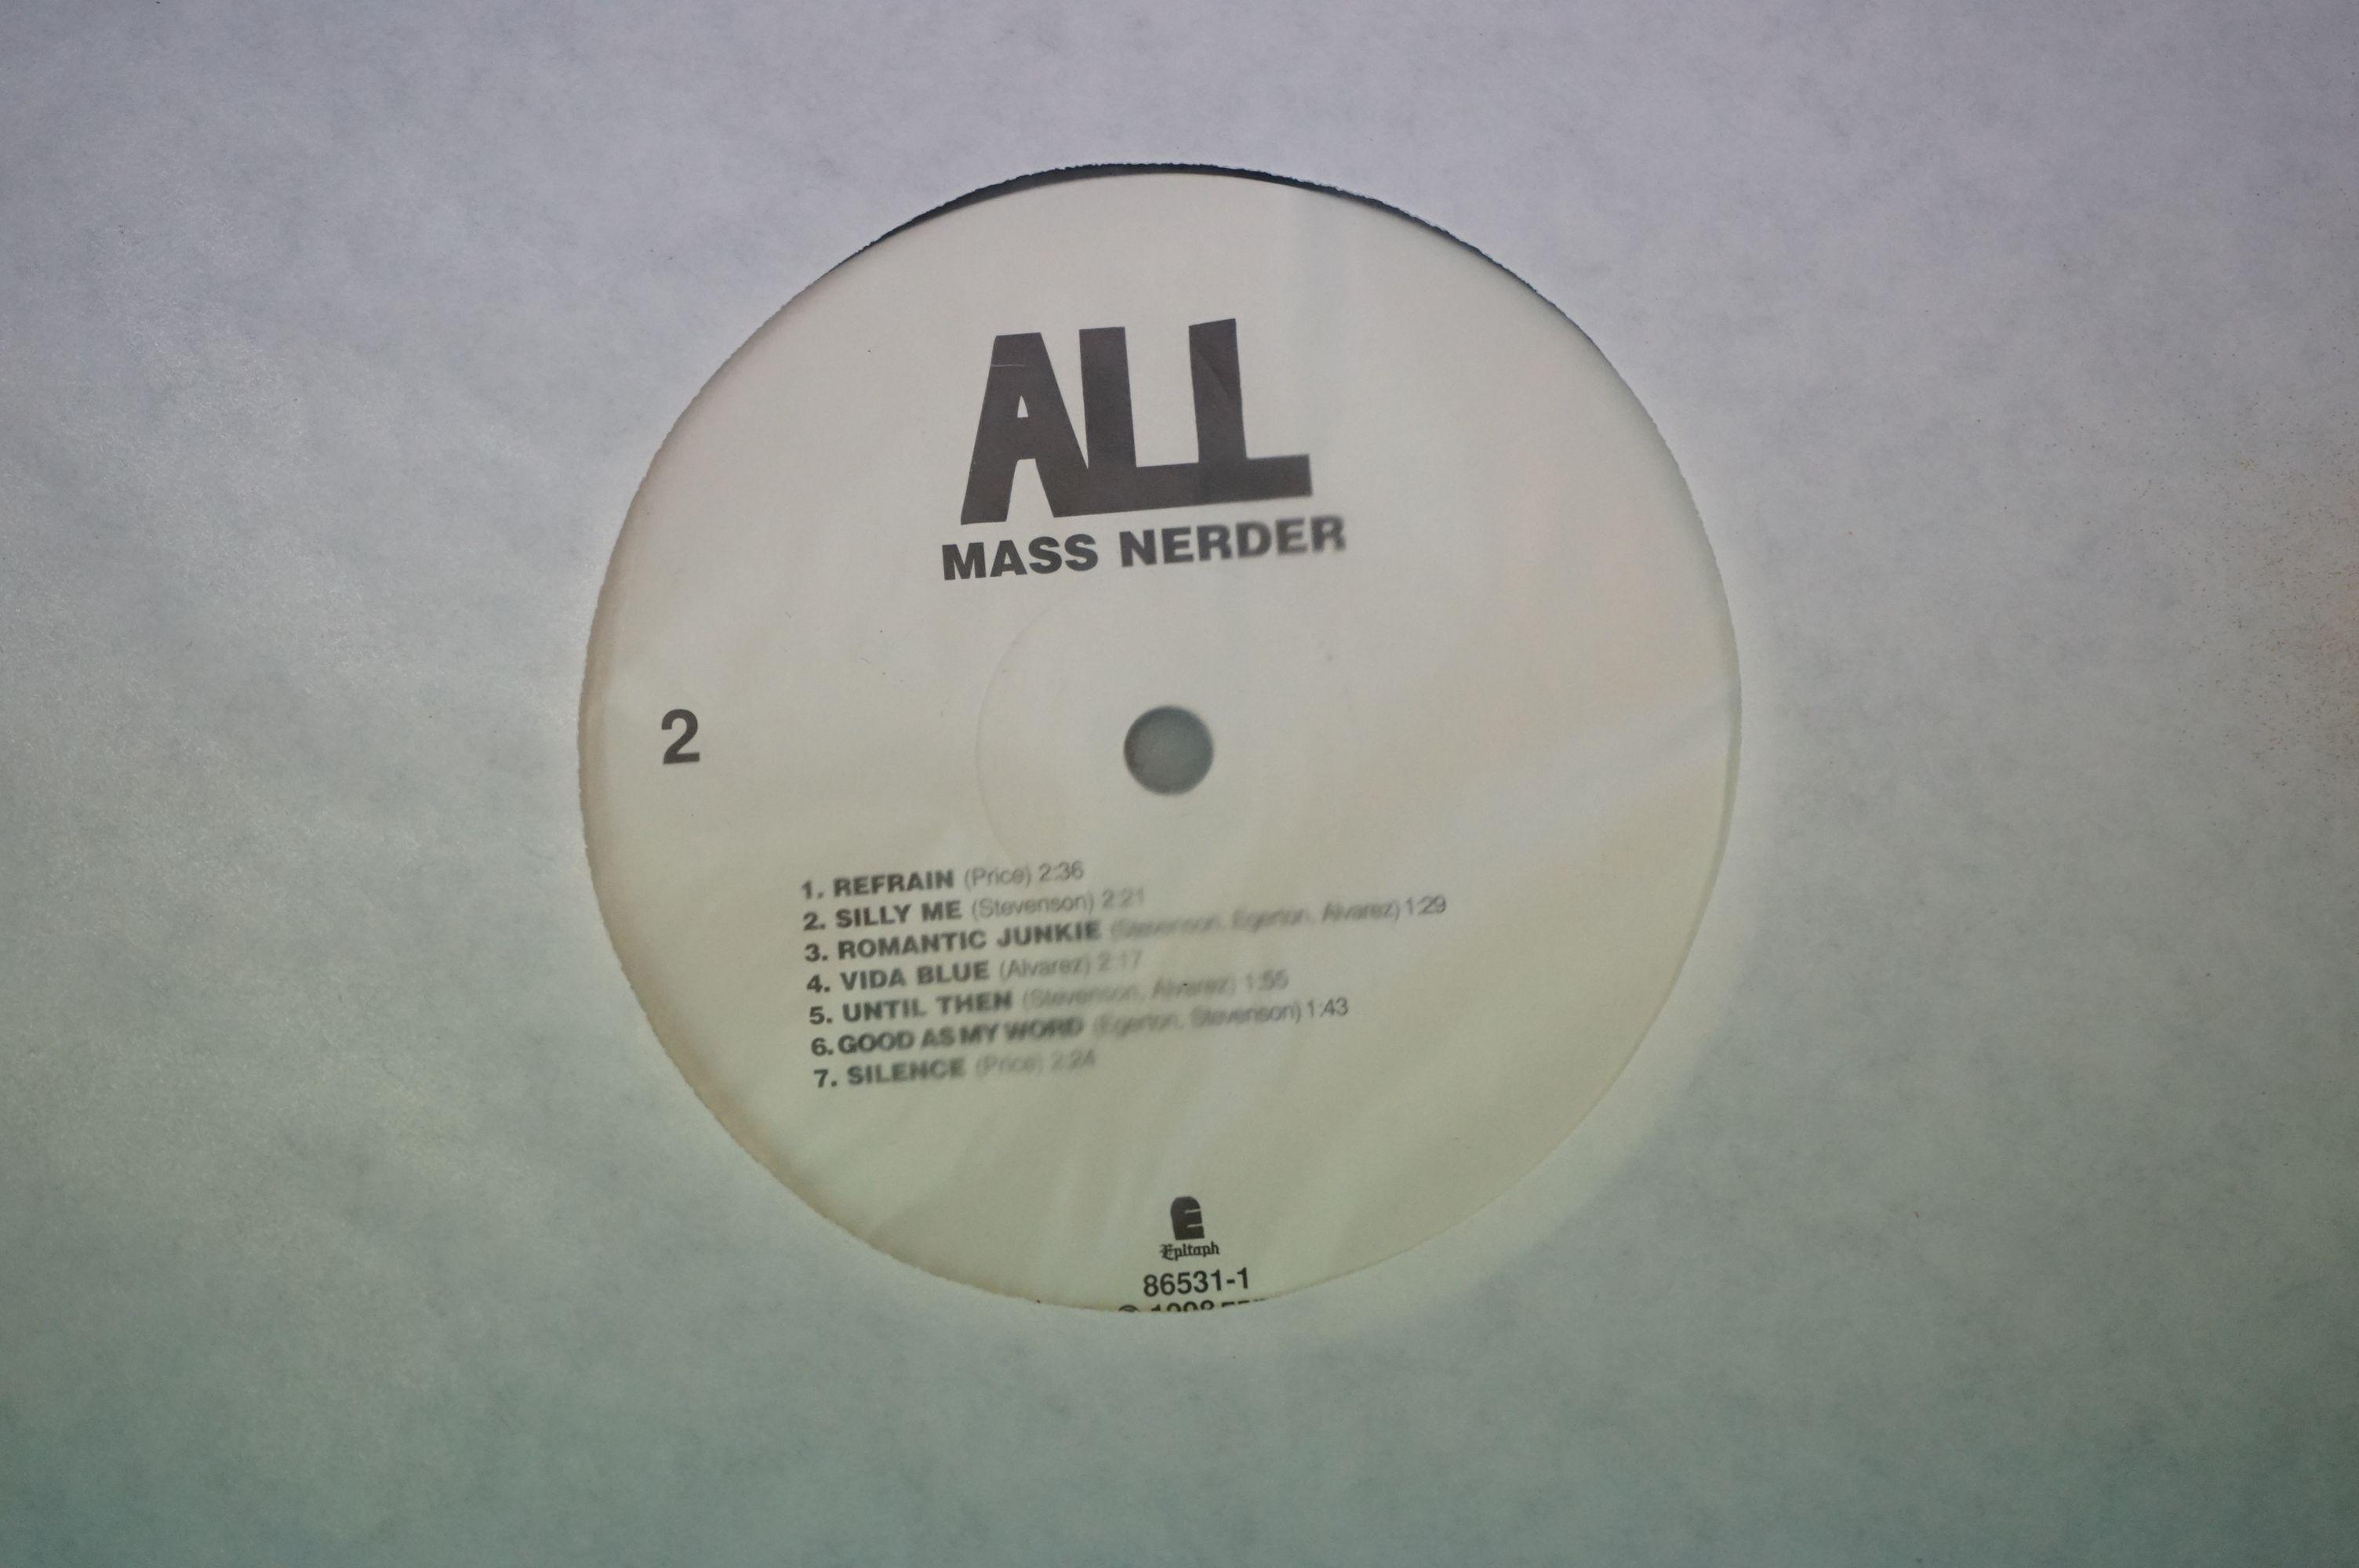 Vinyl - Fleetwood Mac, Kiln House (Reprise RSLP 9004) insert included, sleeve, insert and vinyl vg+ - Image 13 of 14